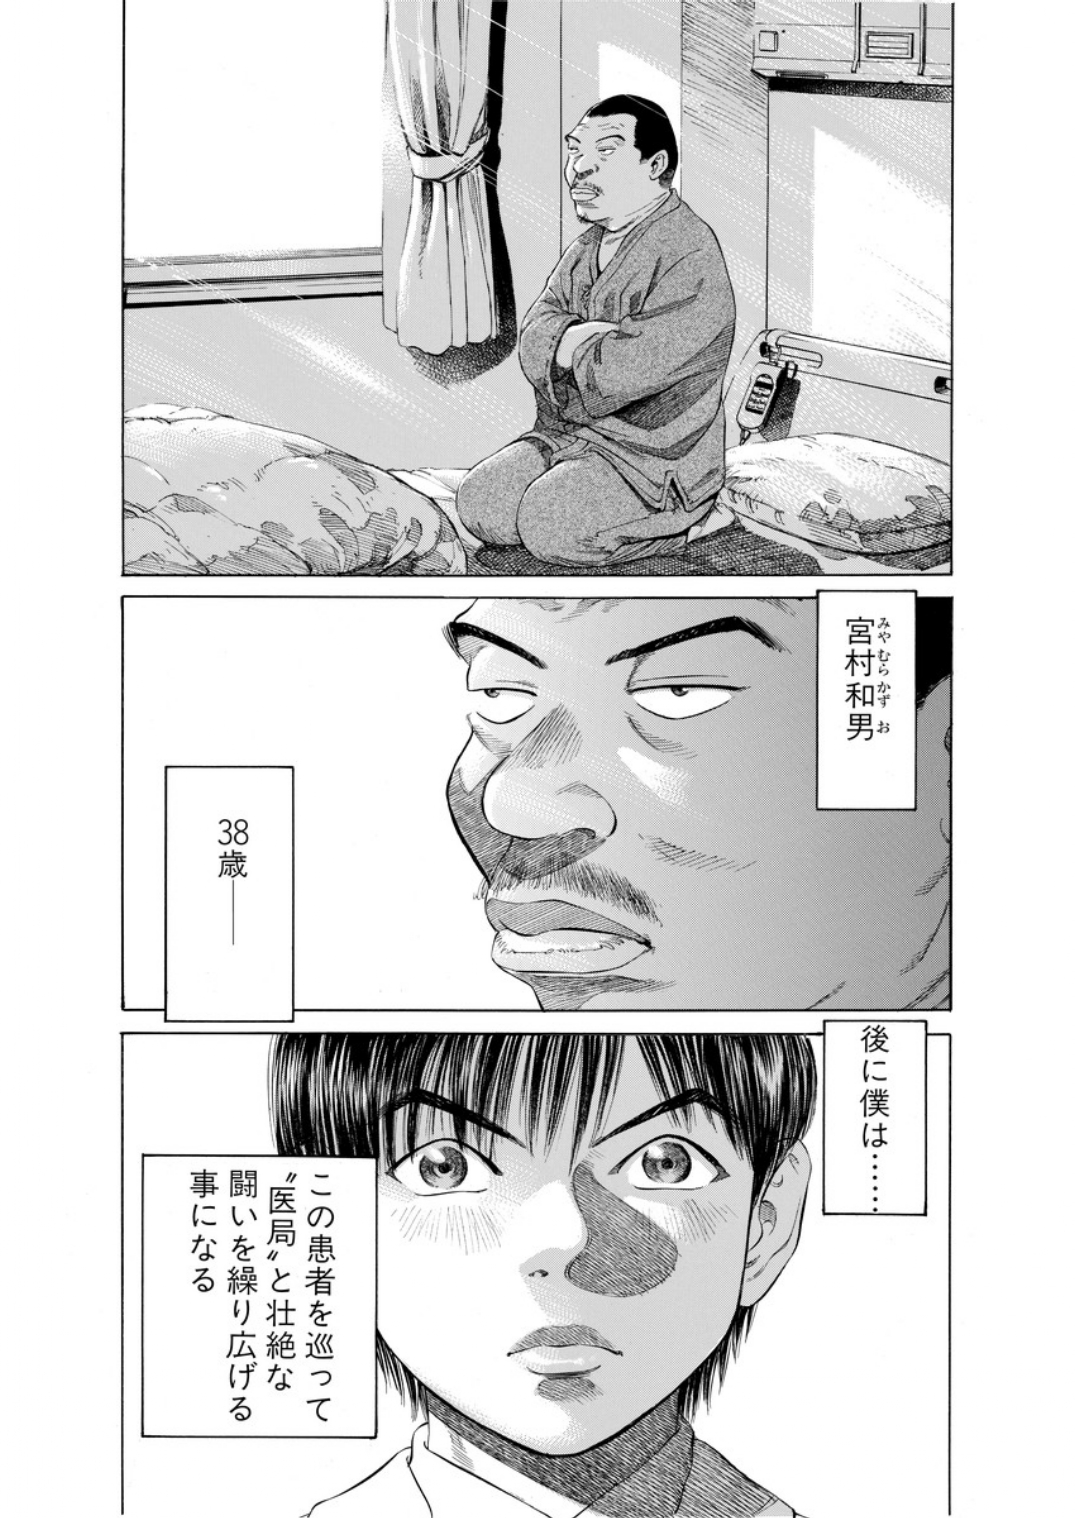 001bj_page-0164.jpg